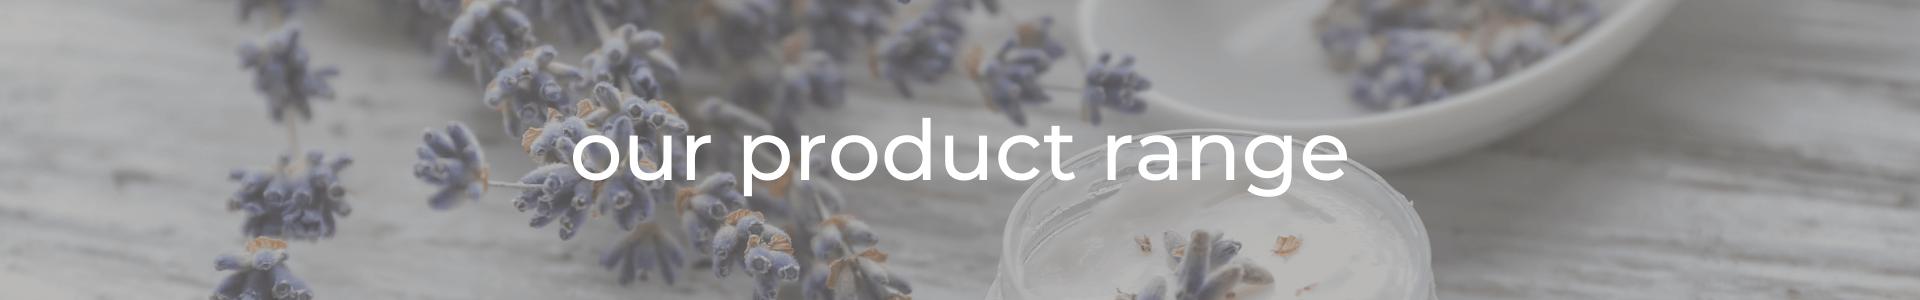 Product Range 1